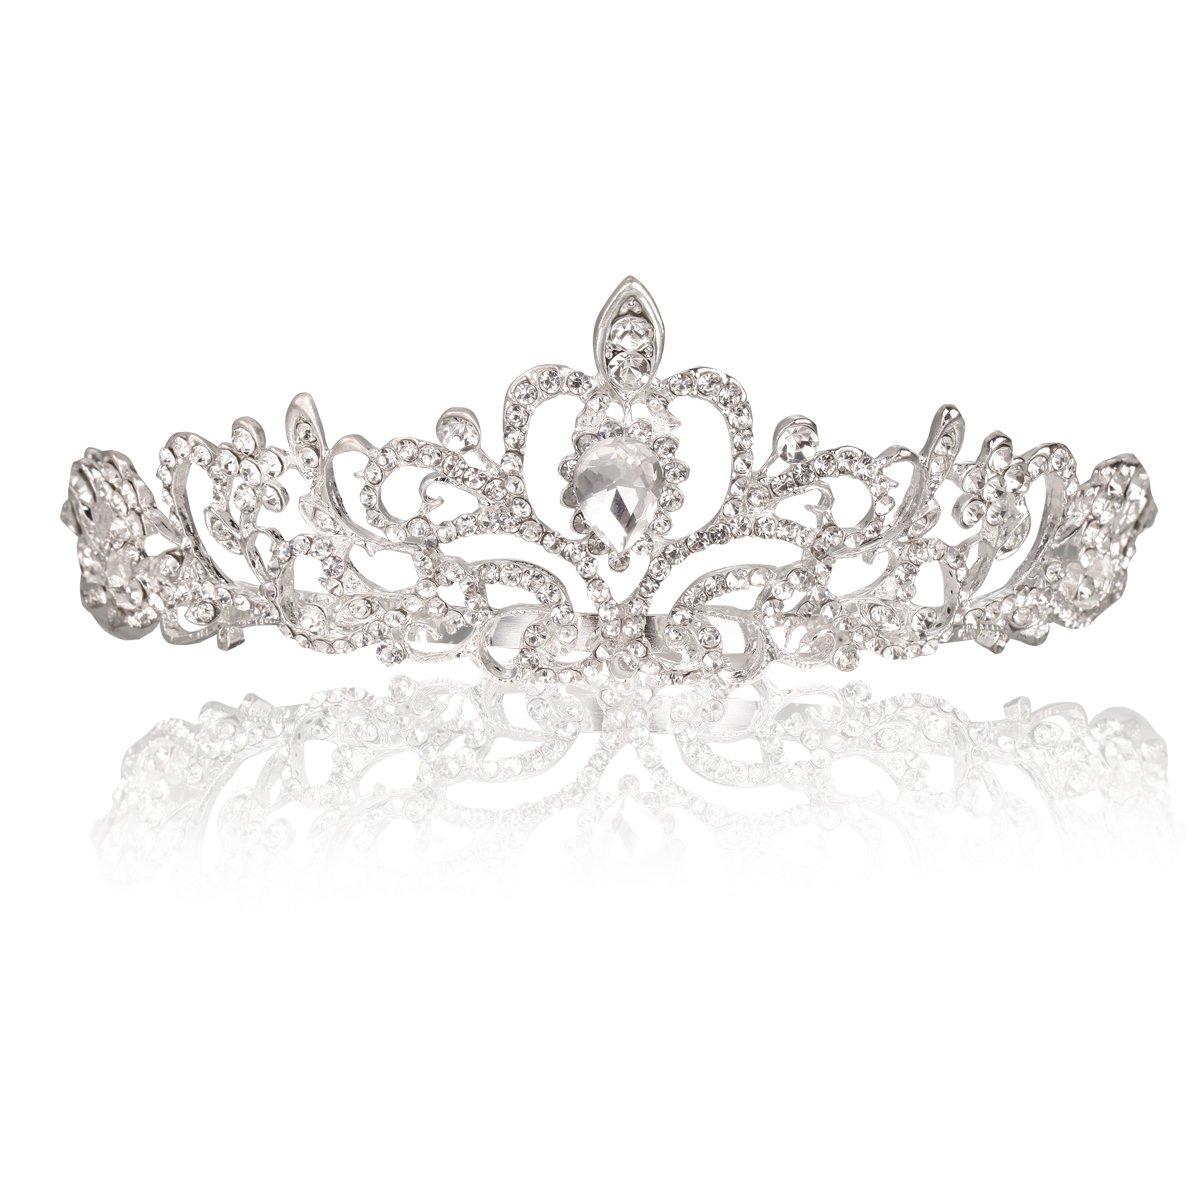 Vinida Crystal Tiara Crown Headband for Wedding Prom Bridal Birthday (Sliver) Makone